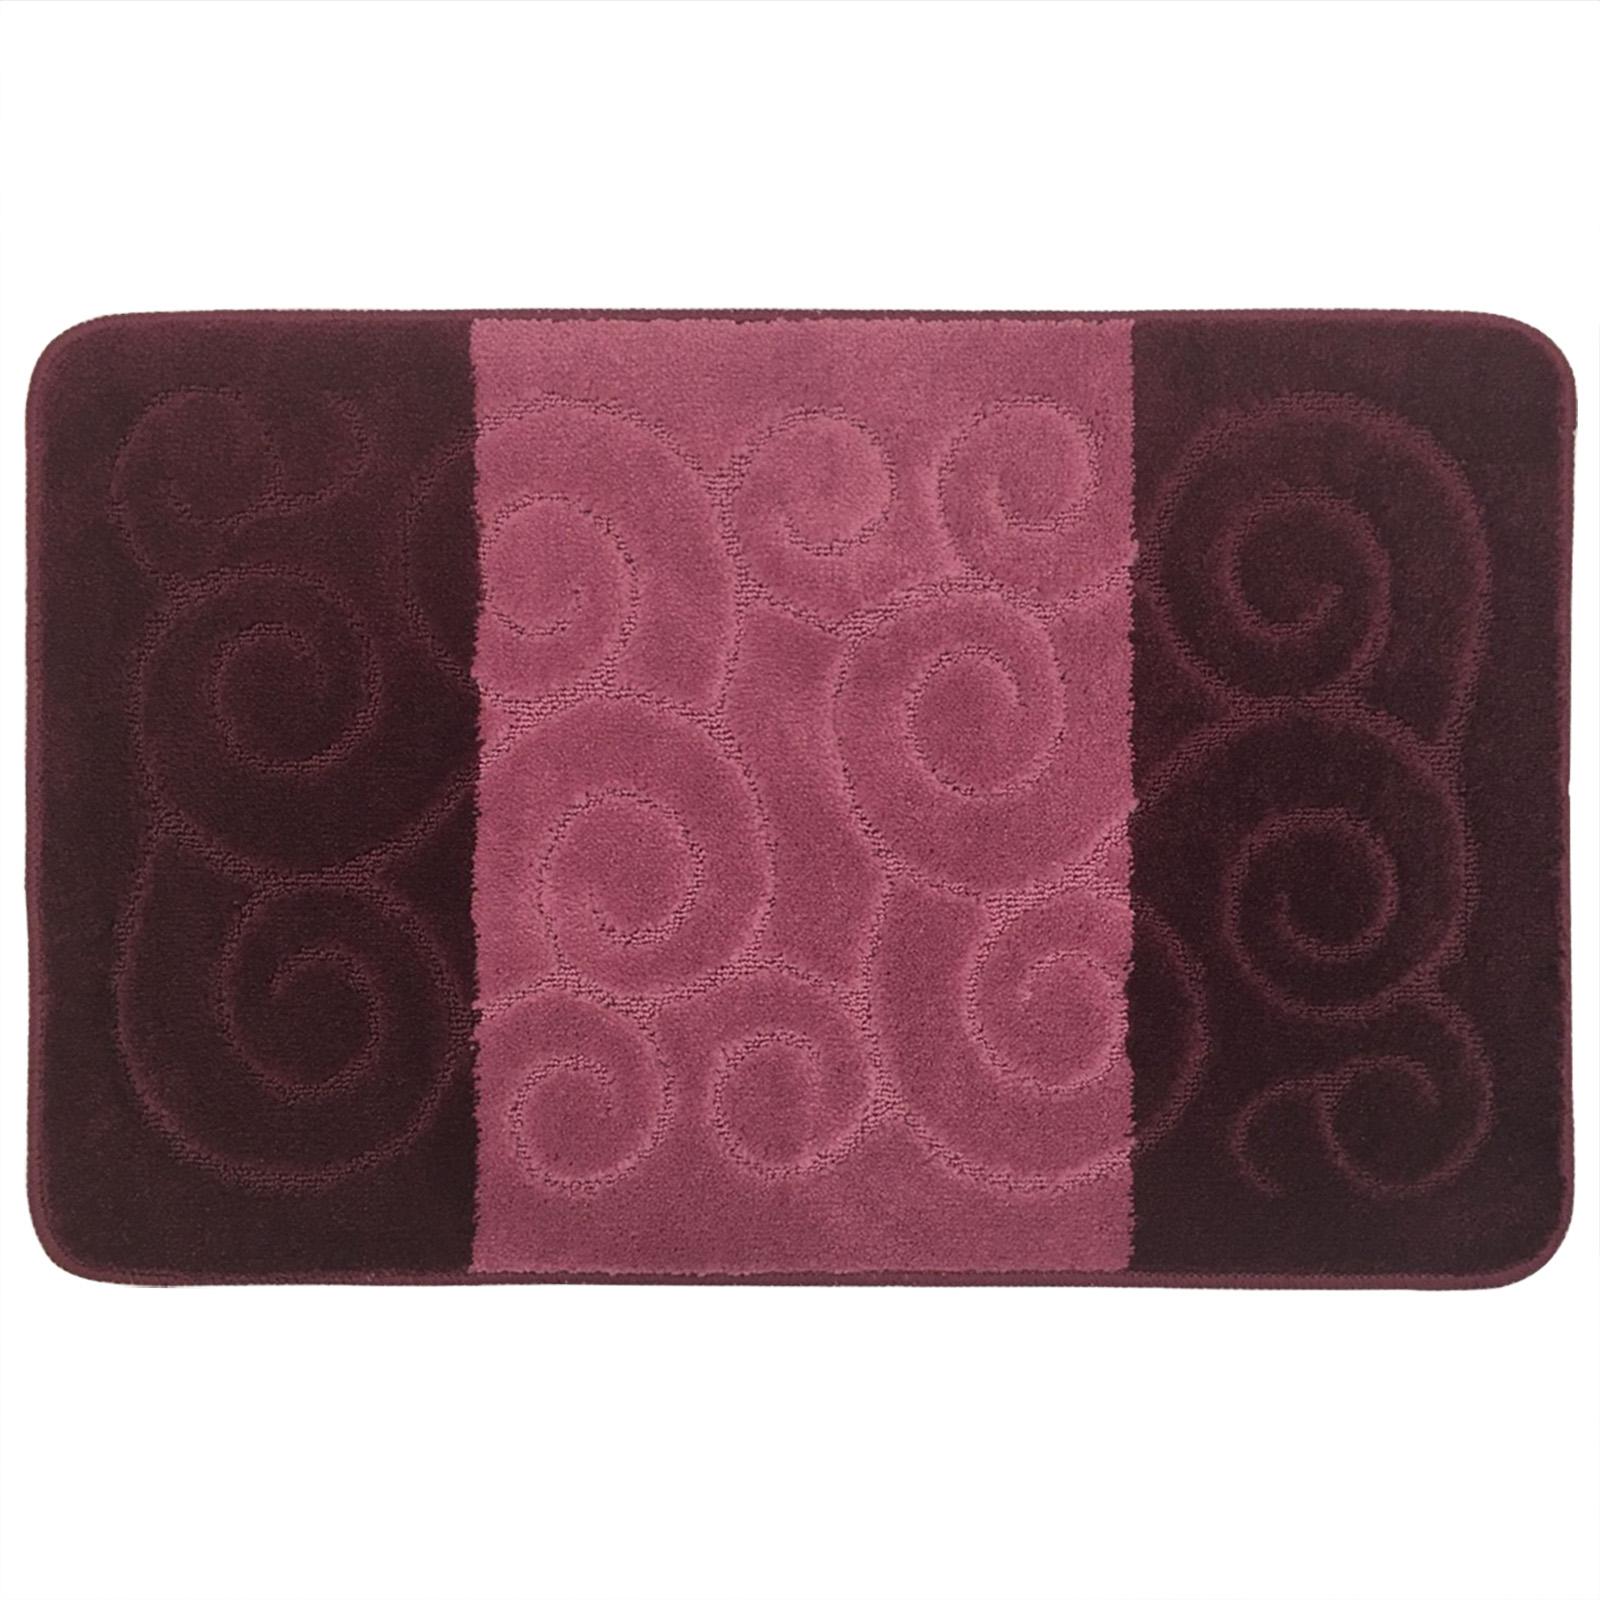 duschvorleger badteppich badematte badgarnitur bad matten. Black Bedroom Furniture Sets. Home Design Ideas